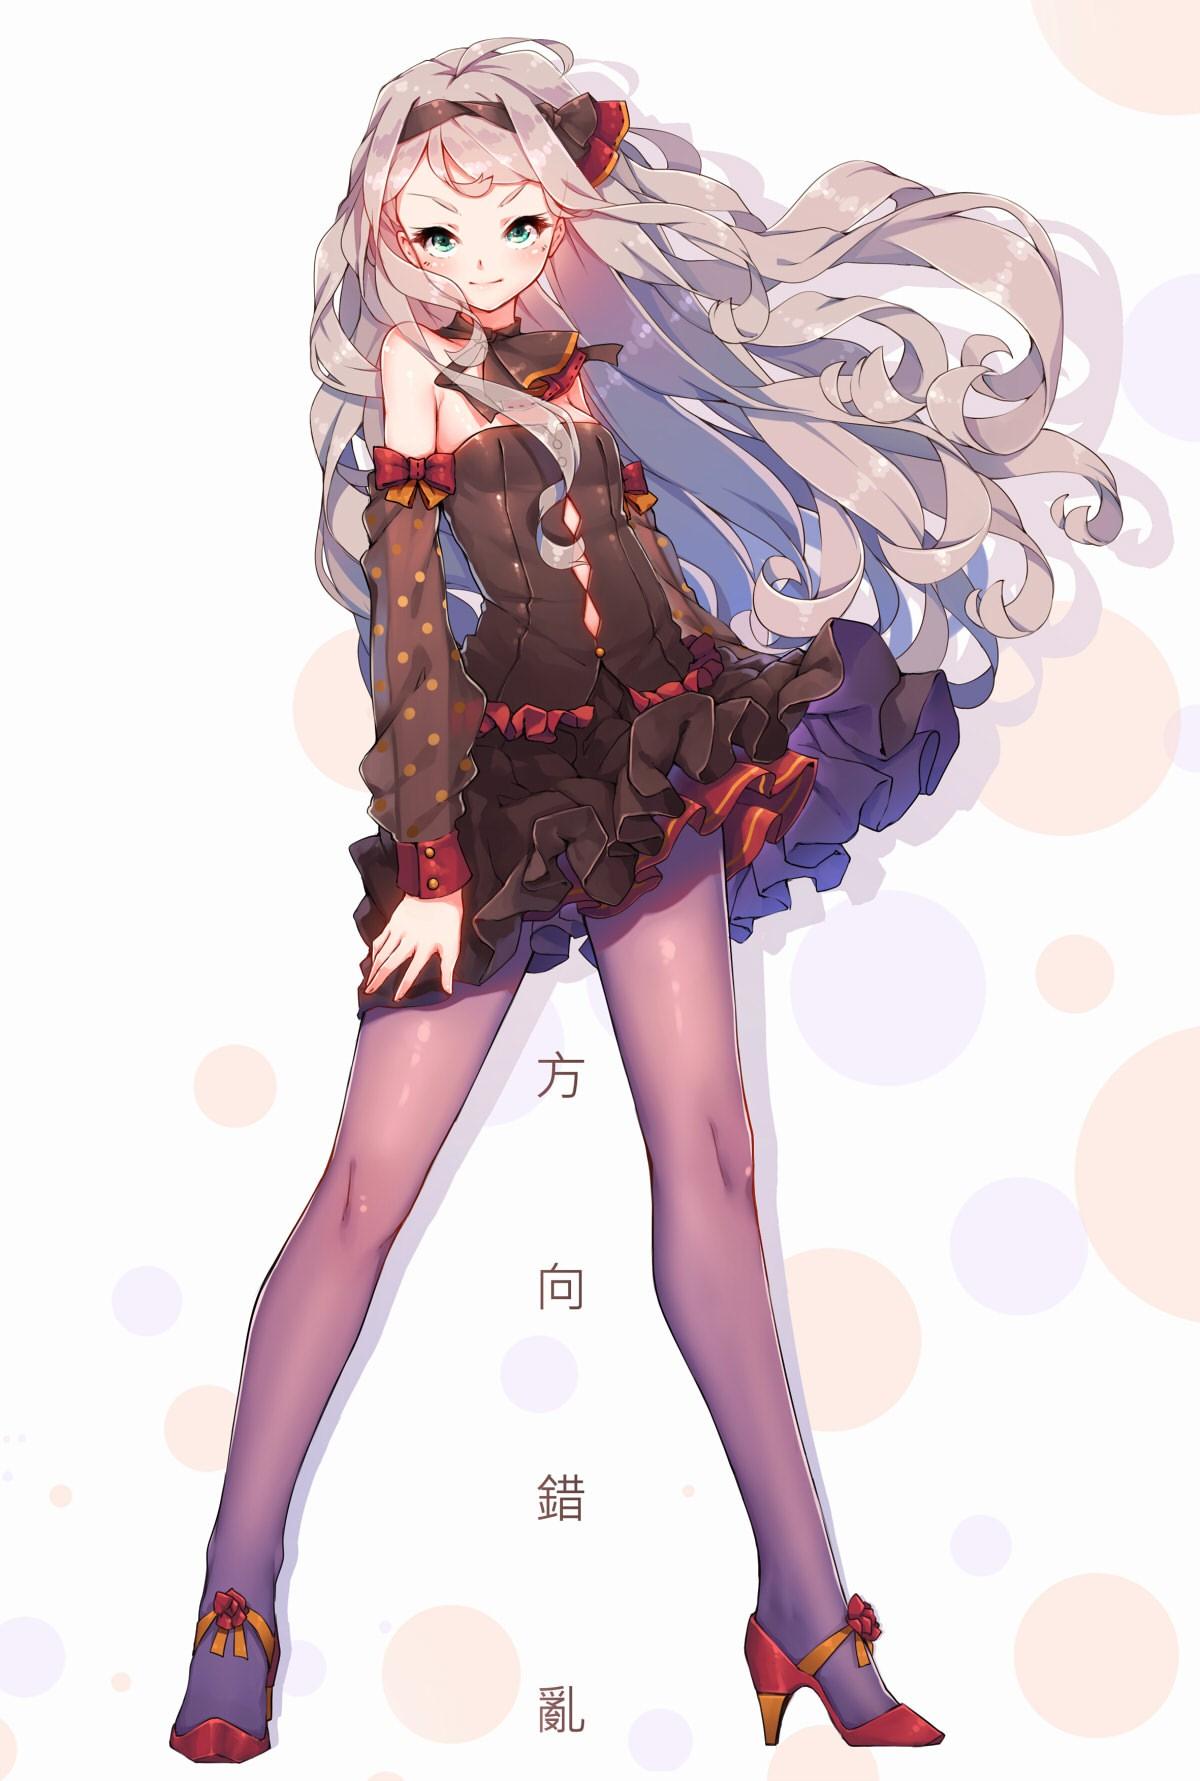 Cute Cupid Wallpapers Wallpaper Anime Girls Cartoon Pixiv Clothing Sketch